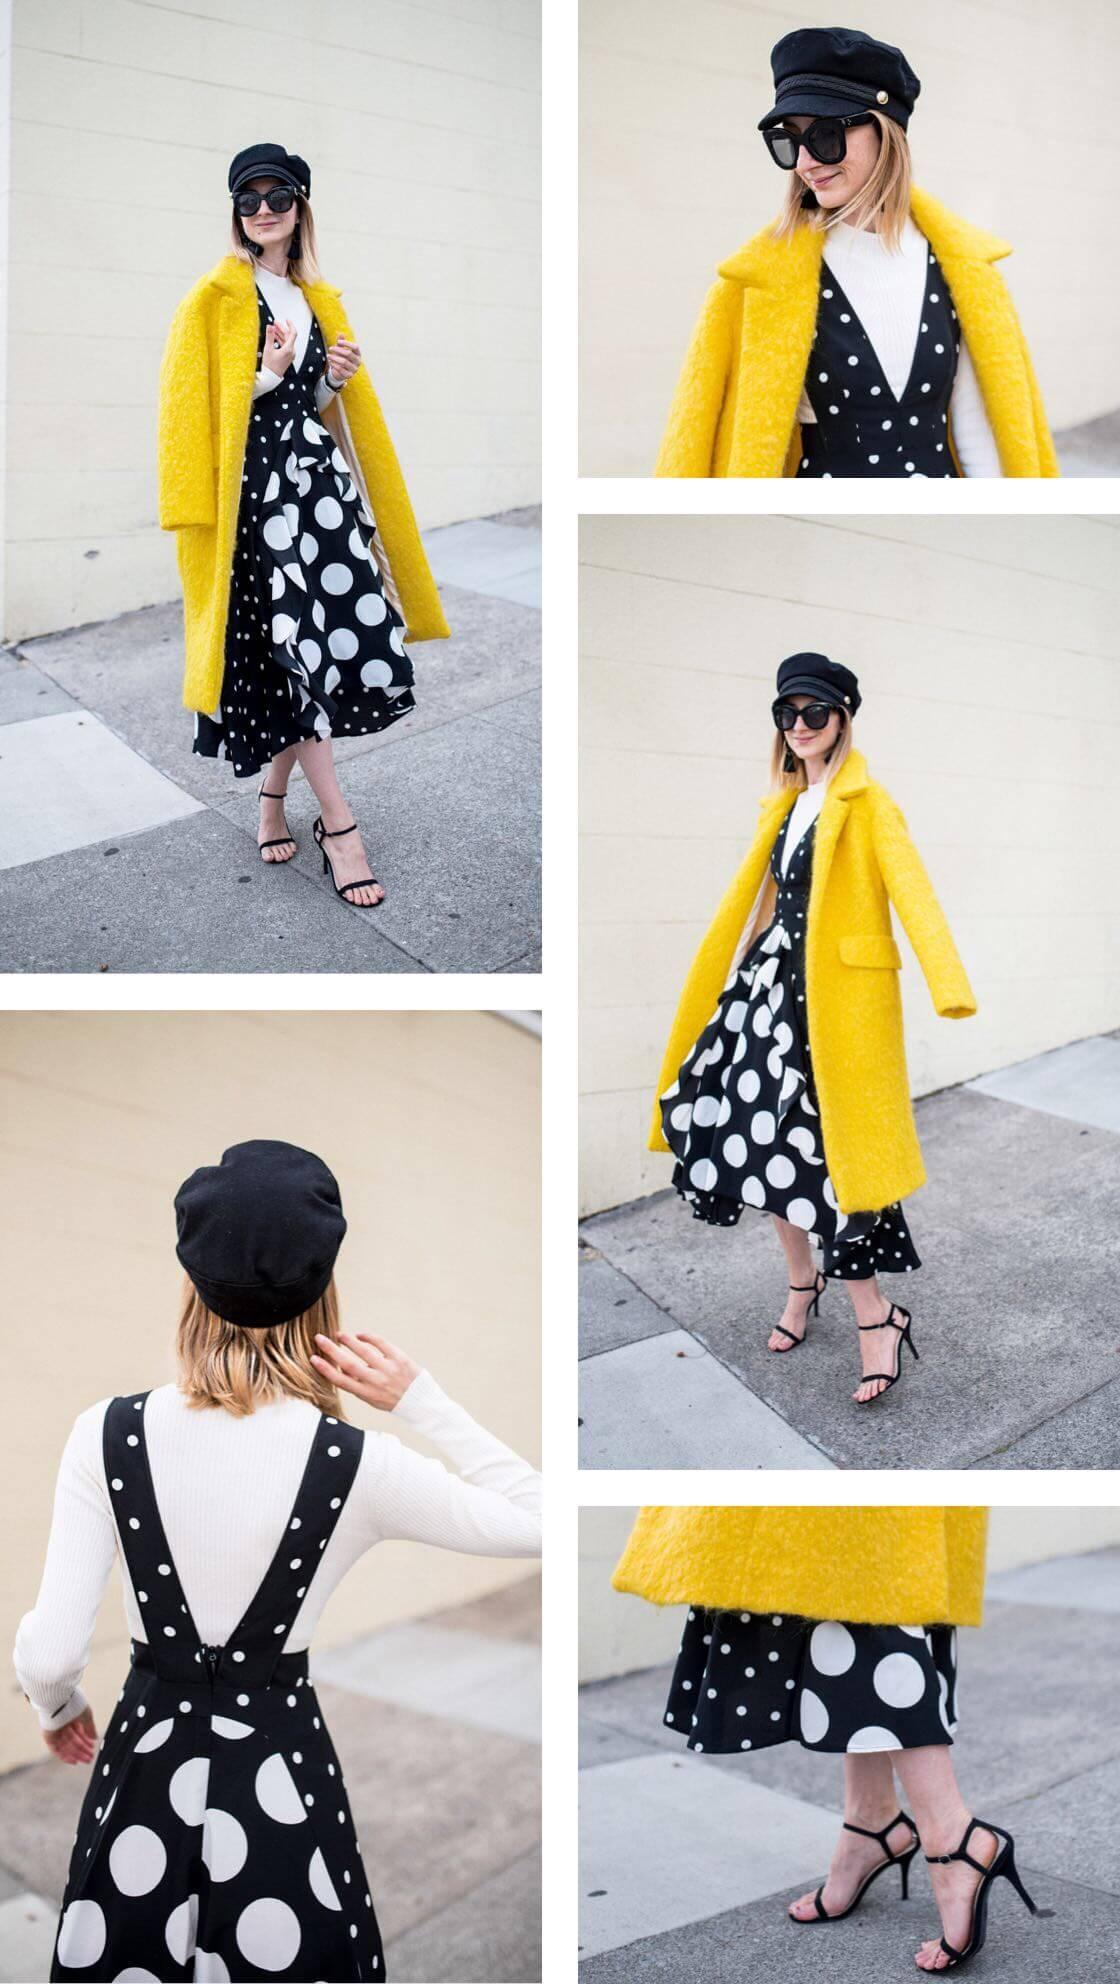 Black-White-Polkadot-Dress-Yellow-WoolCoat.JPG